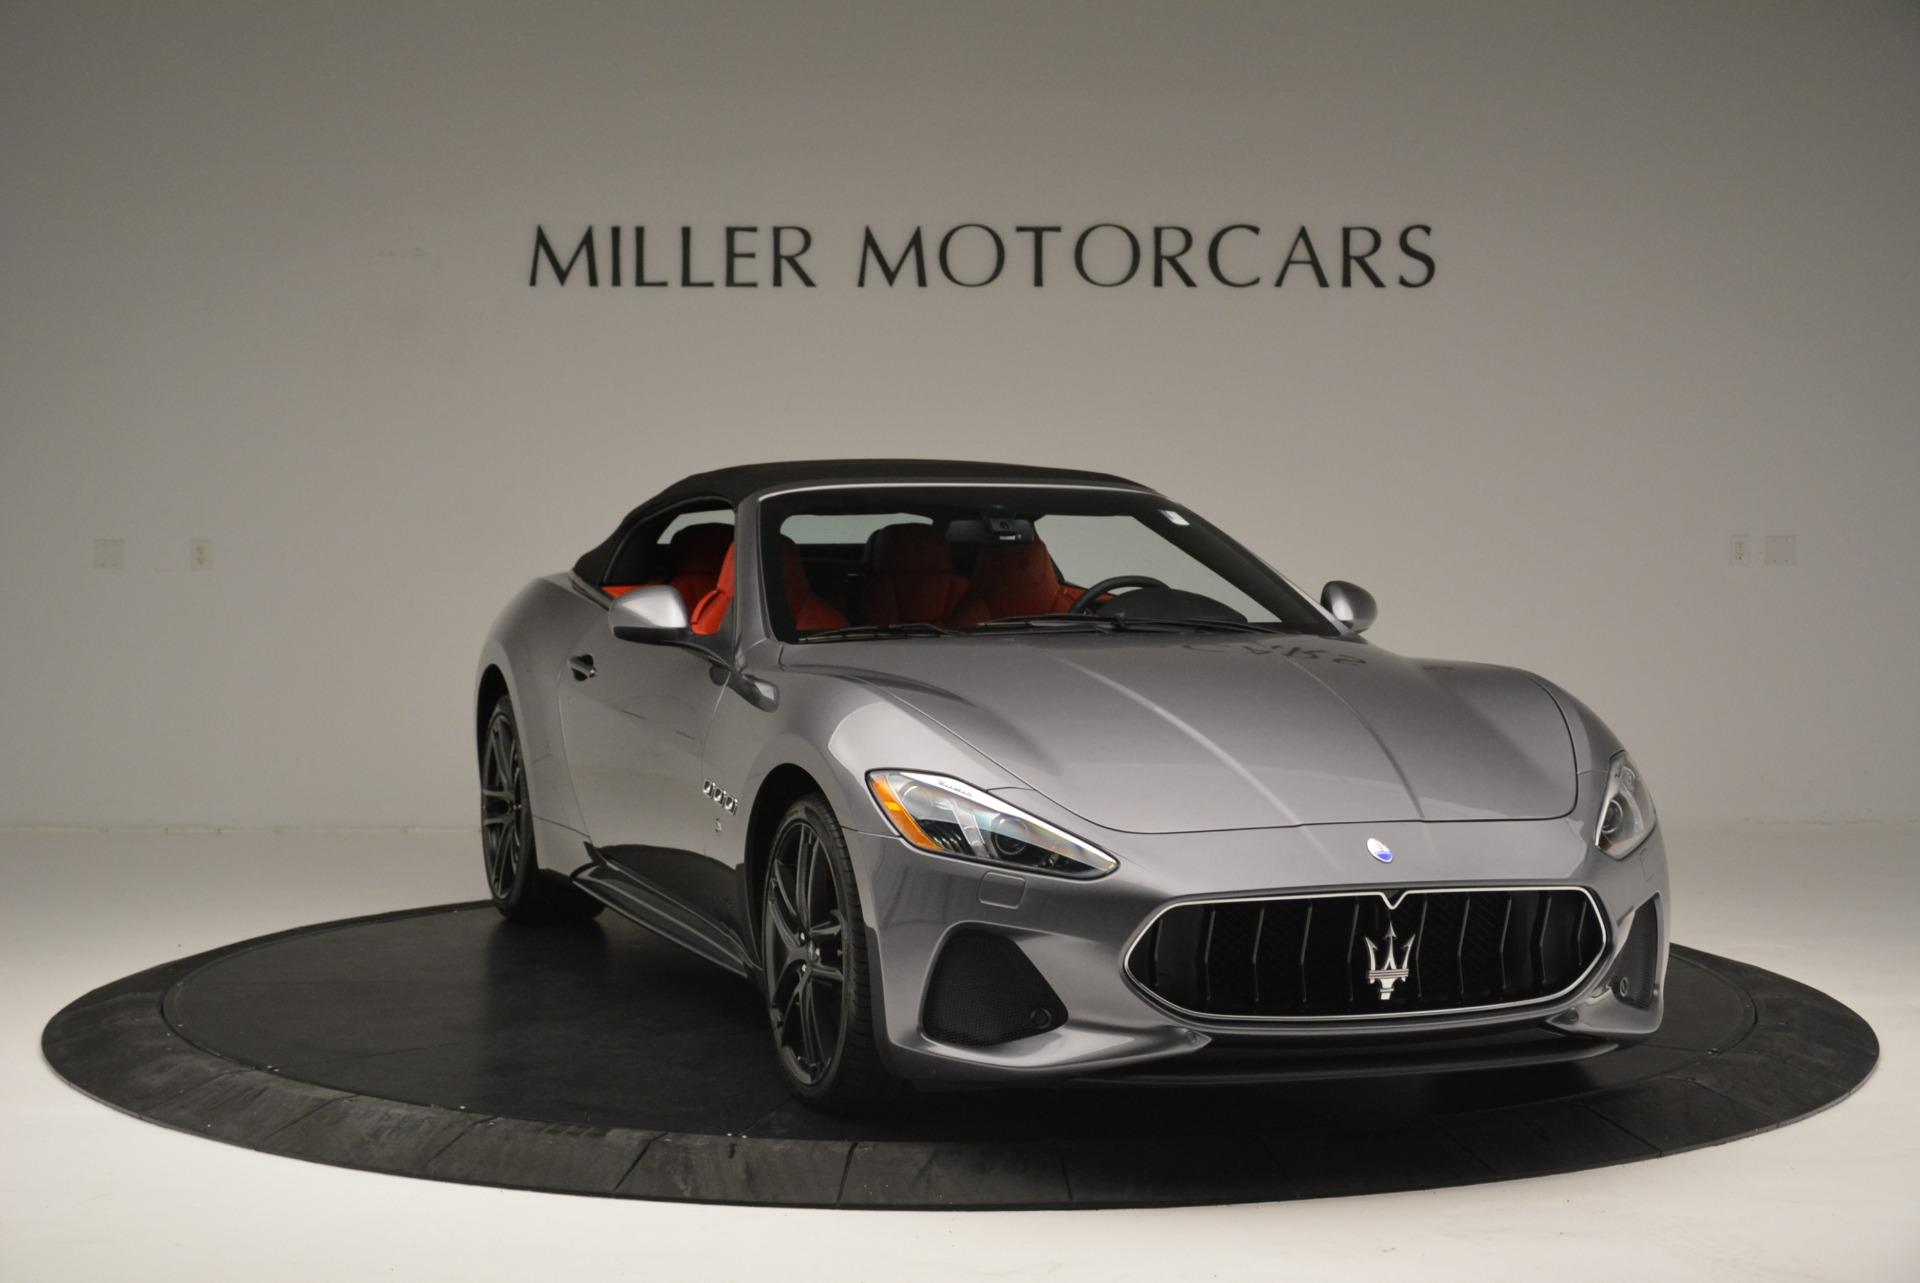 New 2018 Maserati GranTurismo Sport Convertible For Sale In Westport, CT 2182_p23